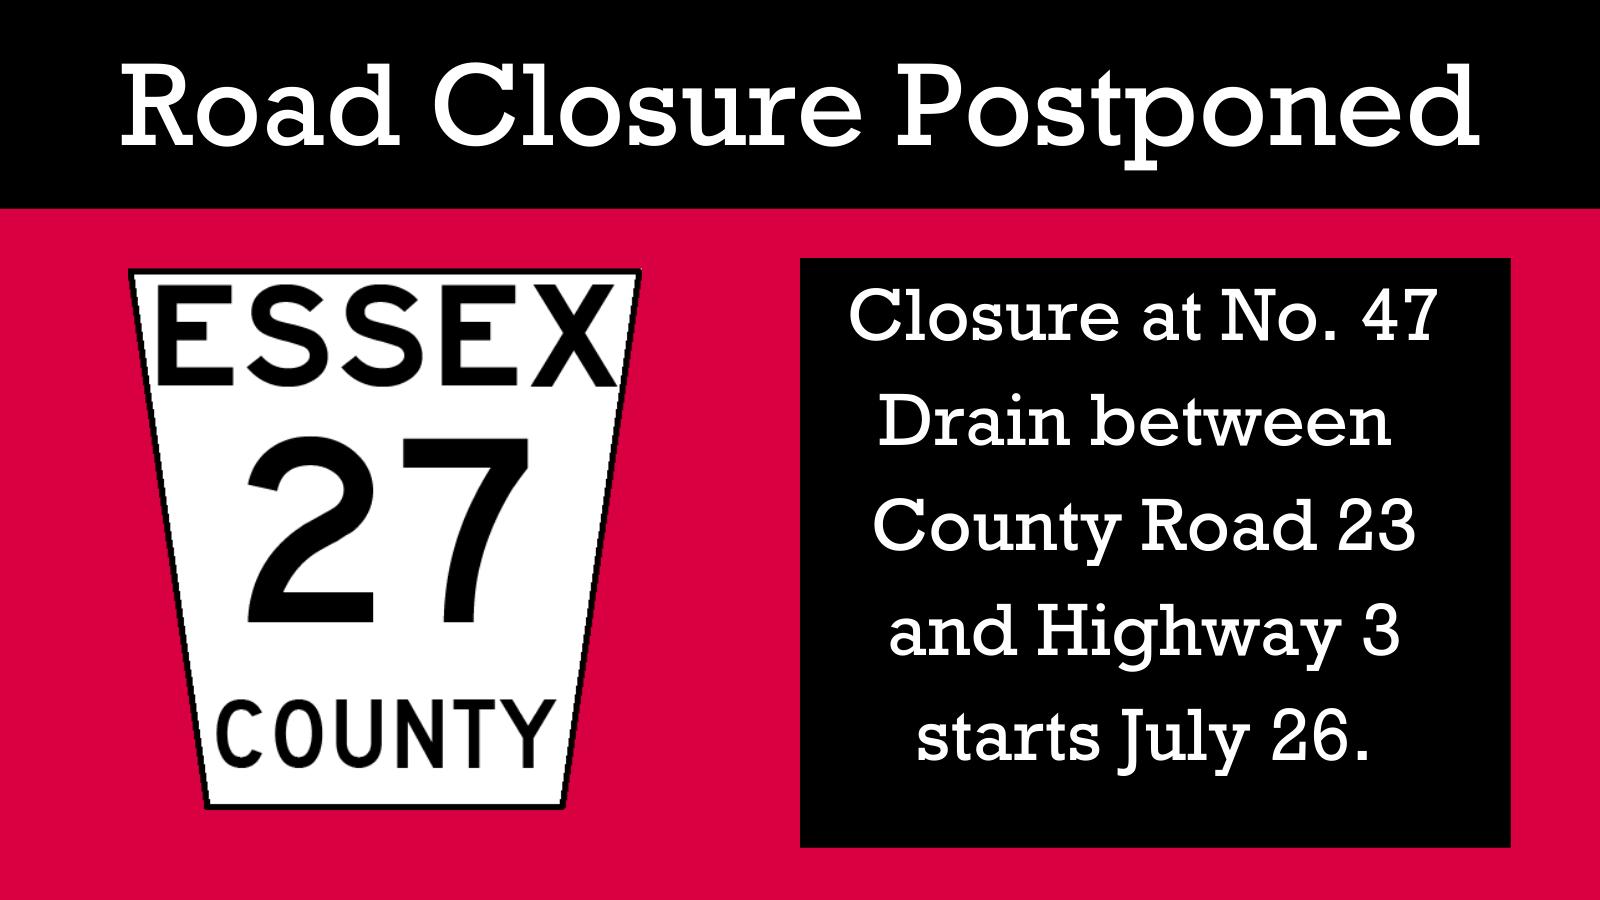 Road closure postponed. Essex County 27 closure at No. 47 Drain between  County Road 23 and Highway 3  starts July 26.